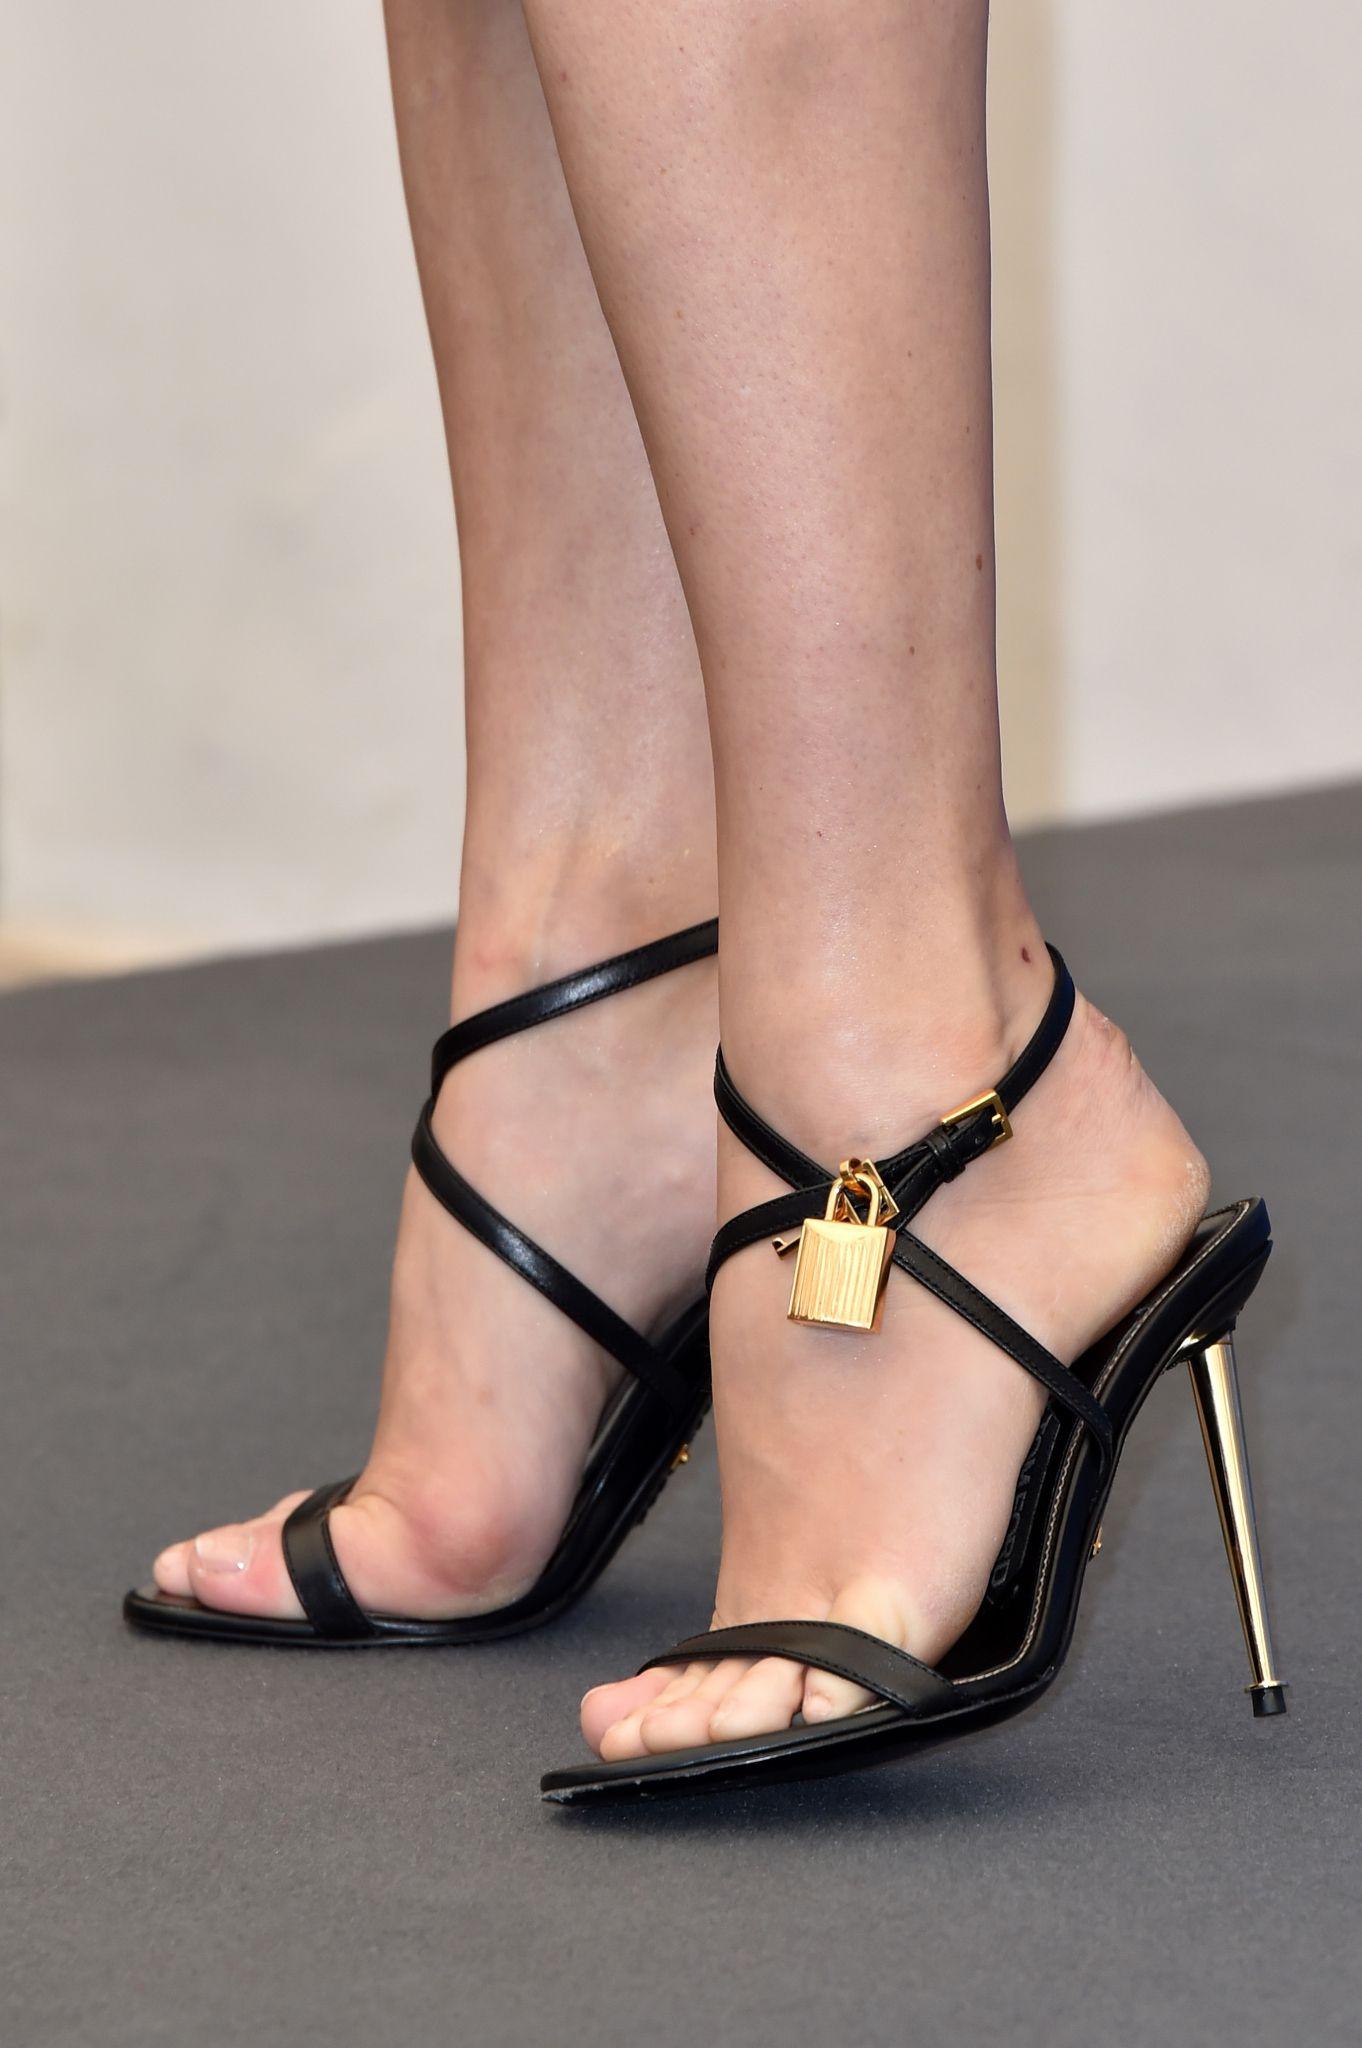 Amy Adams S Feet